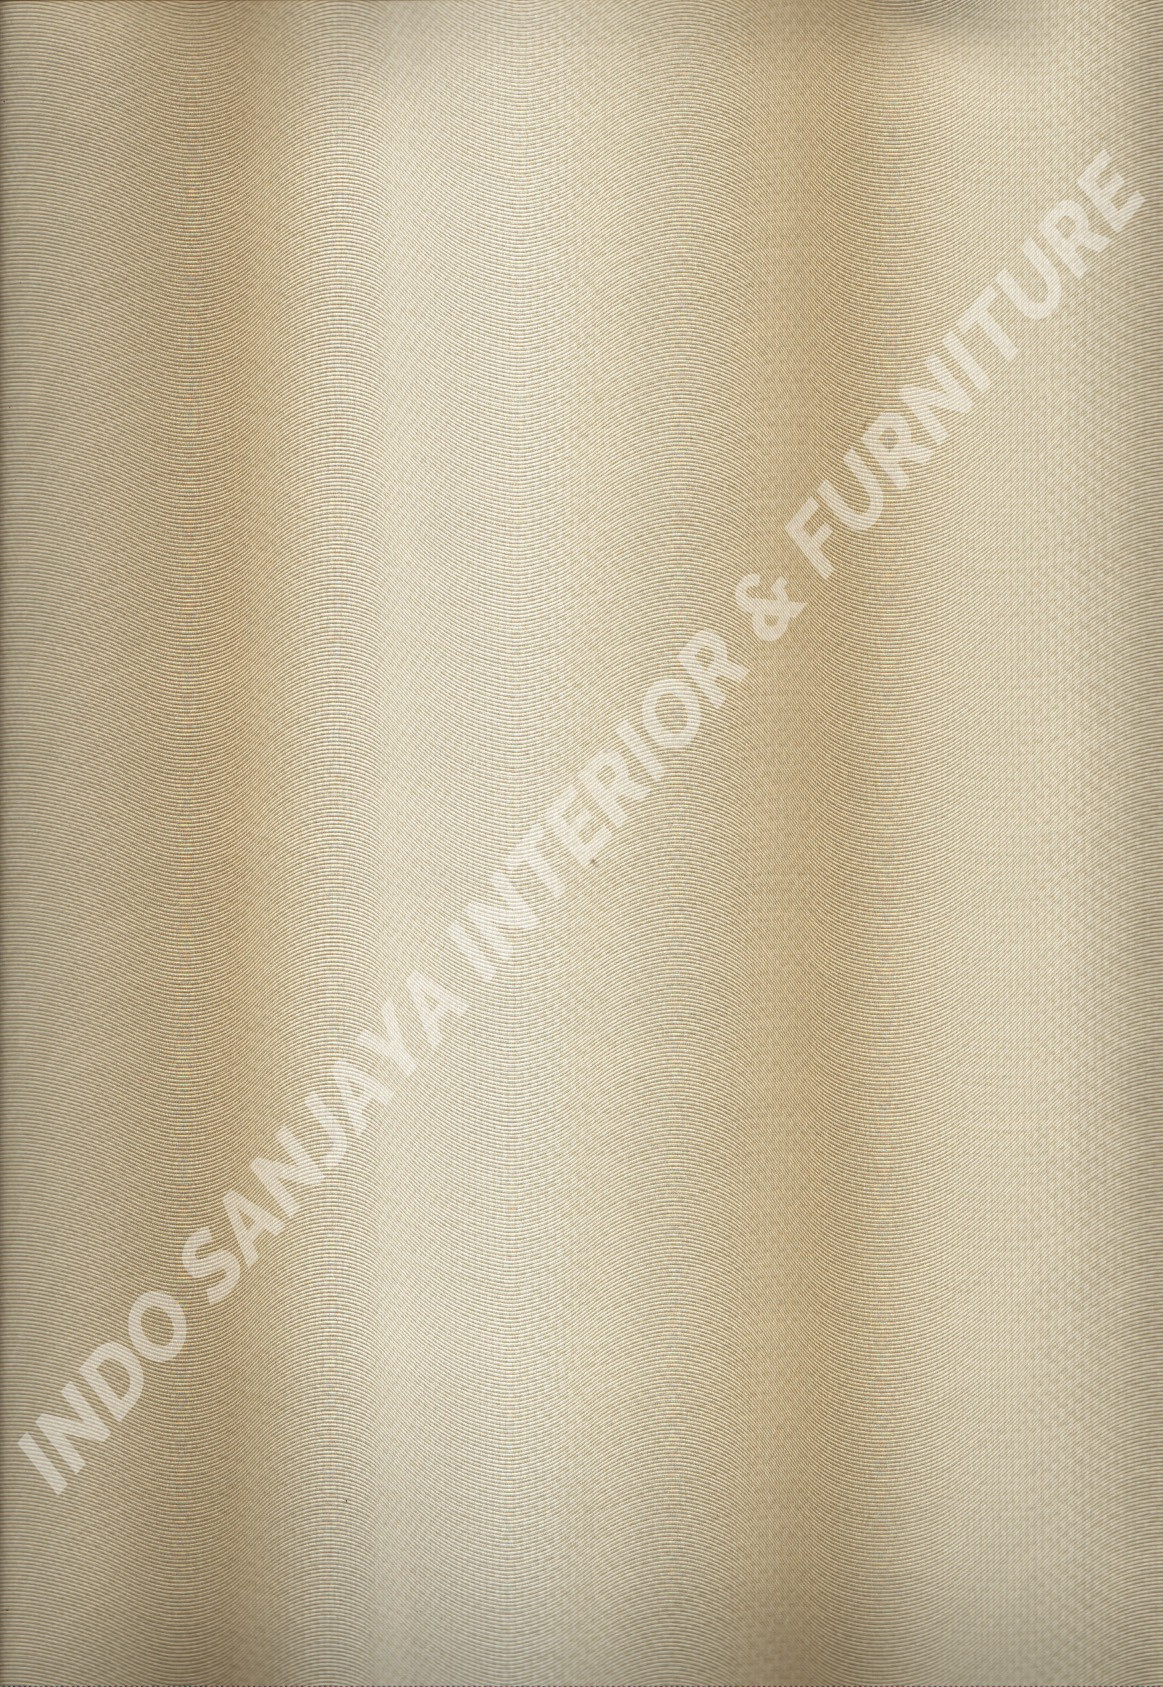 wallpaper   Wallpaper Minimalis Polos 2571-3:2571-3 corak  warna